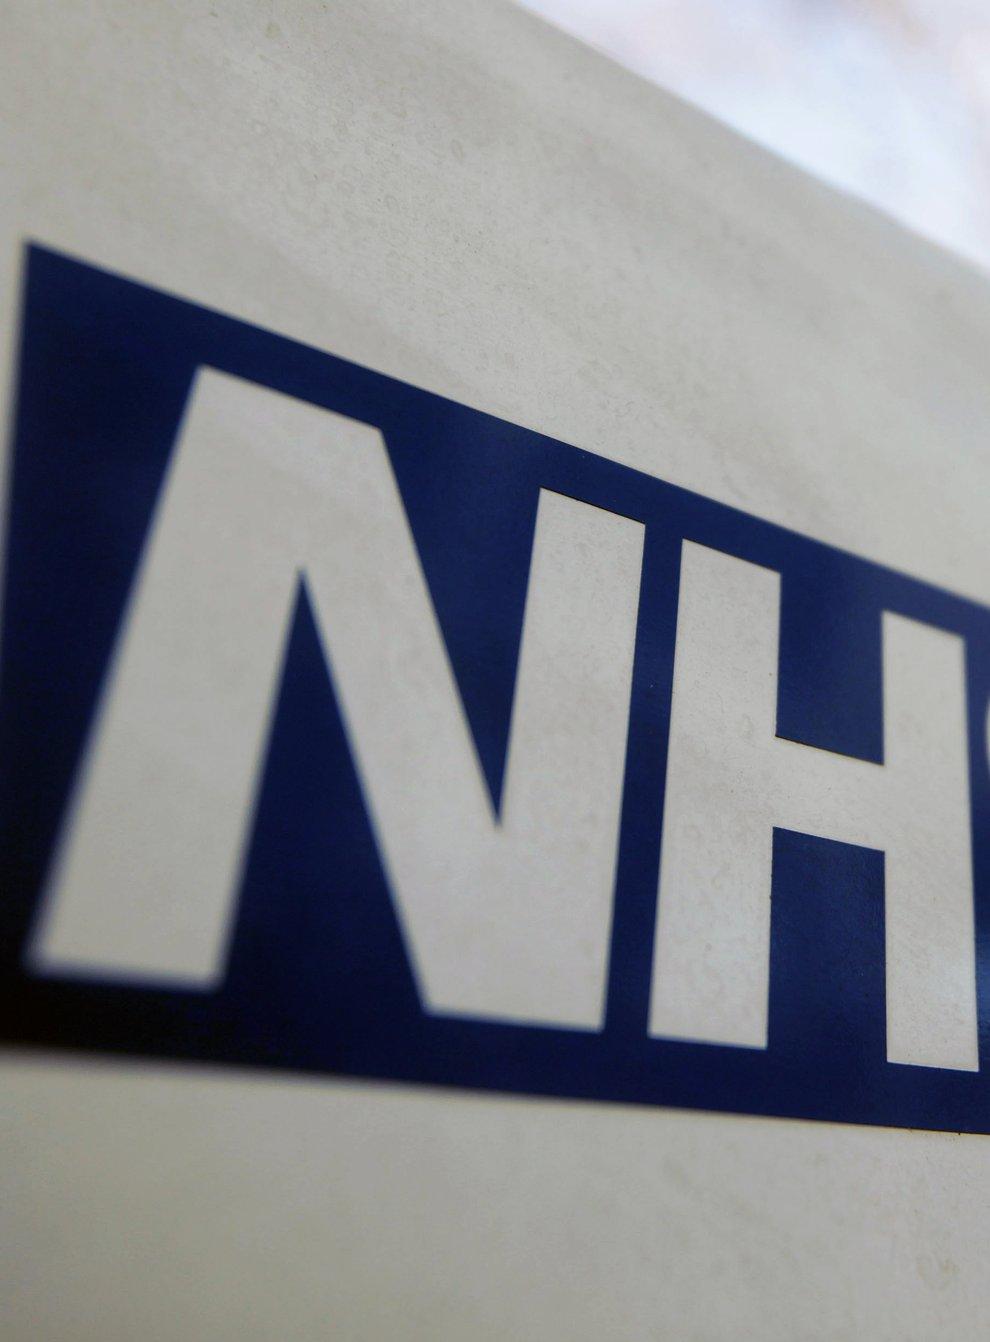 <p>An NHS sign</p>